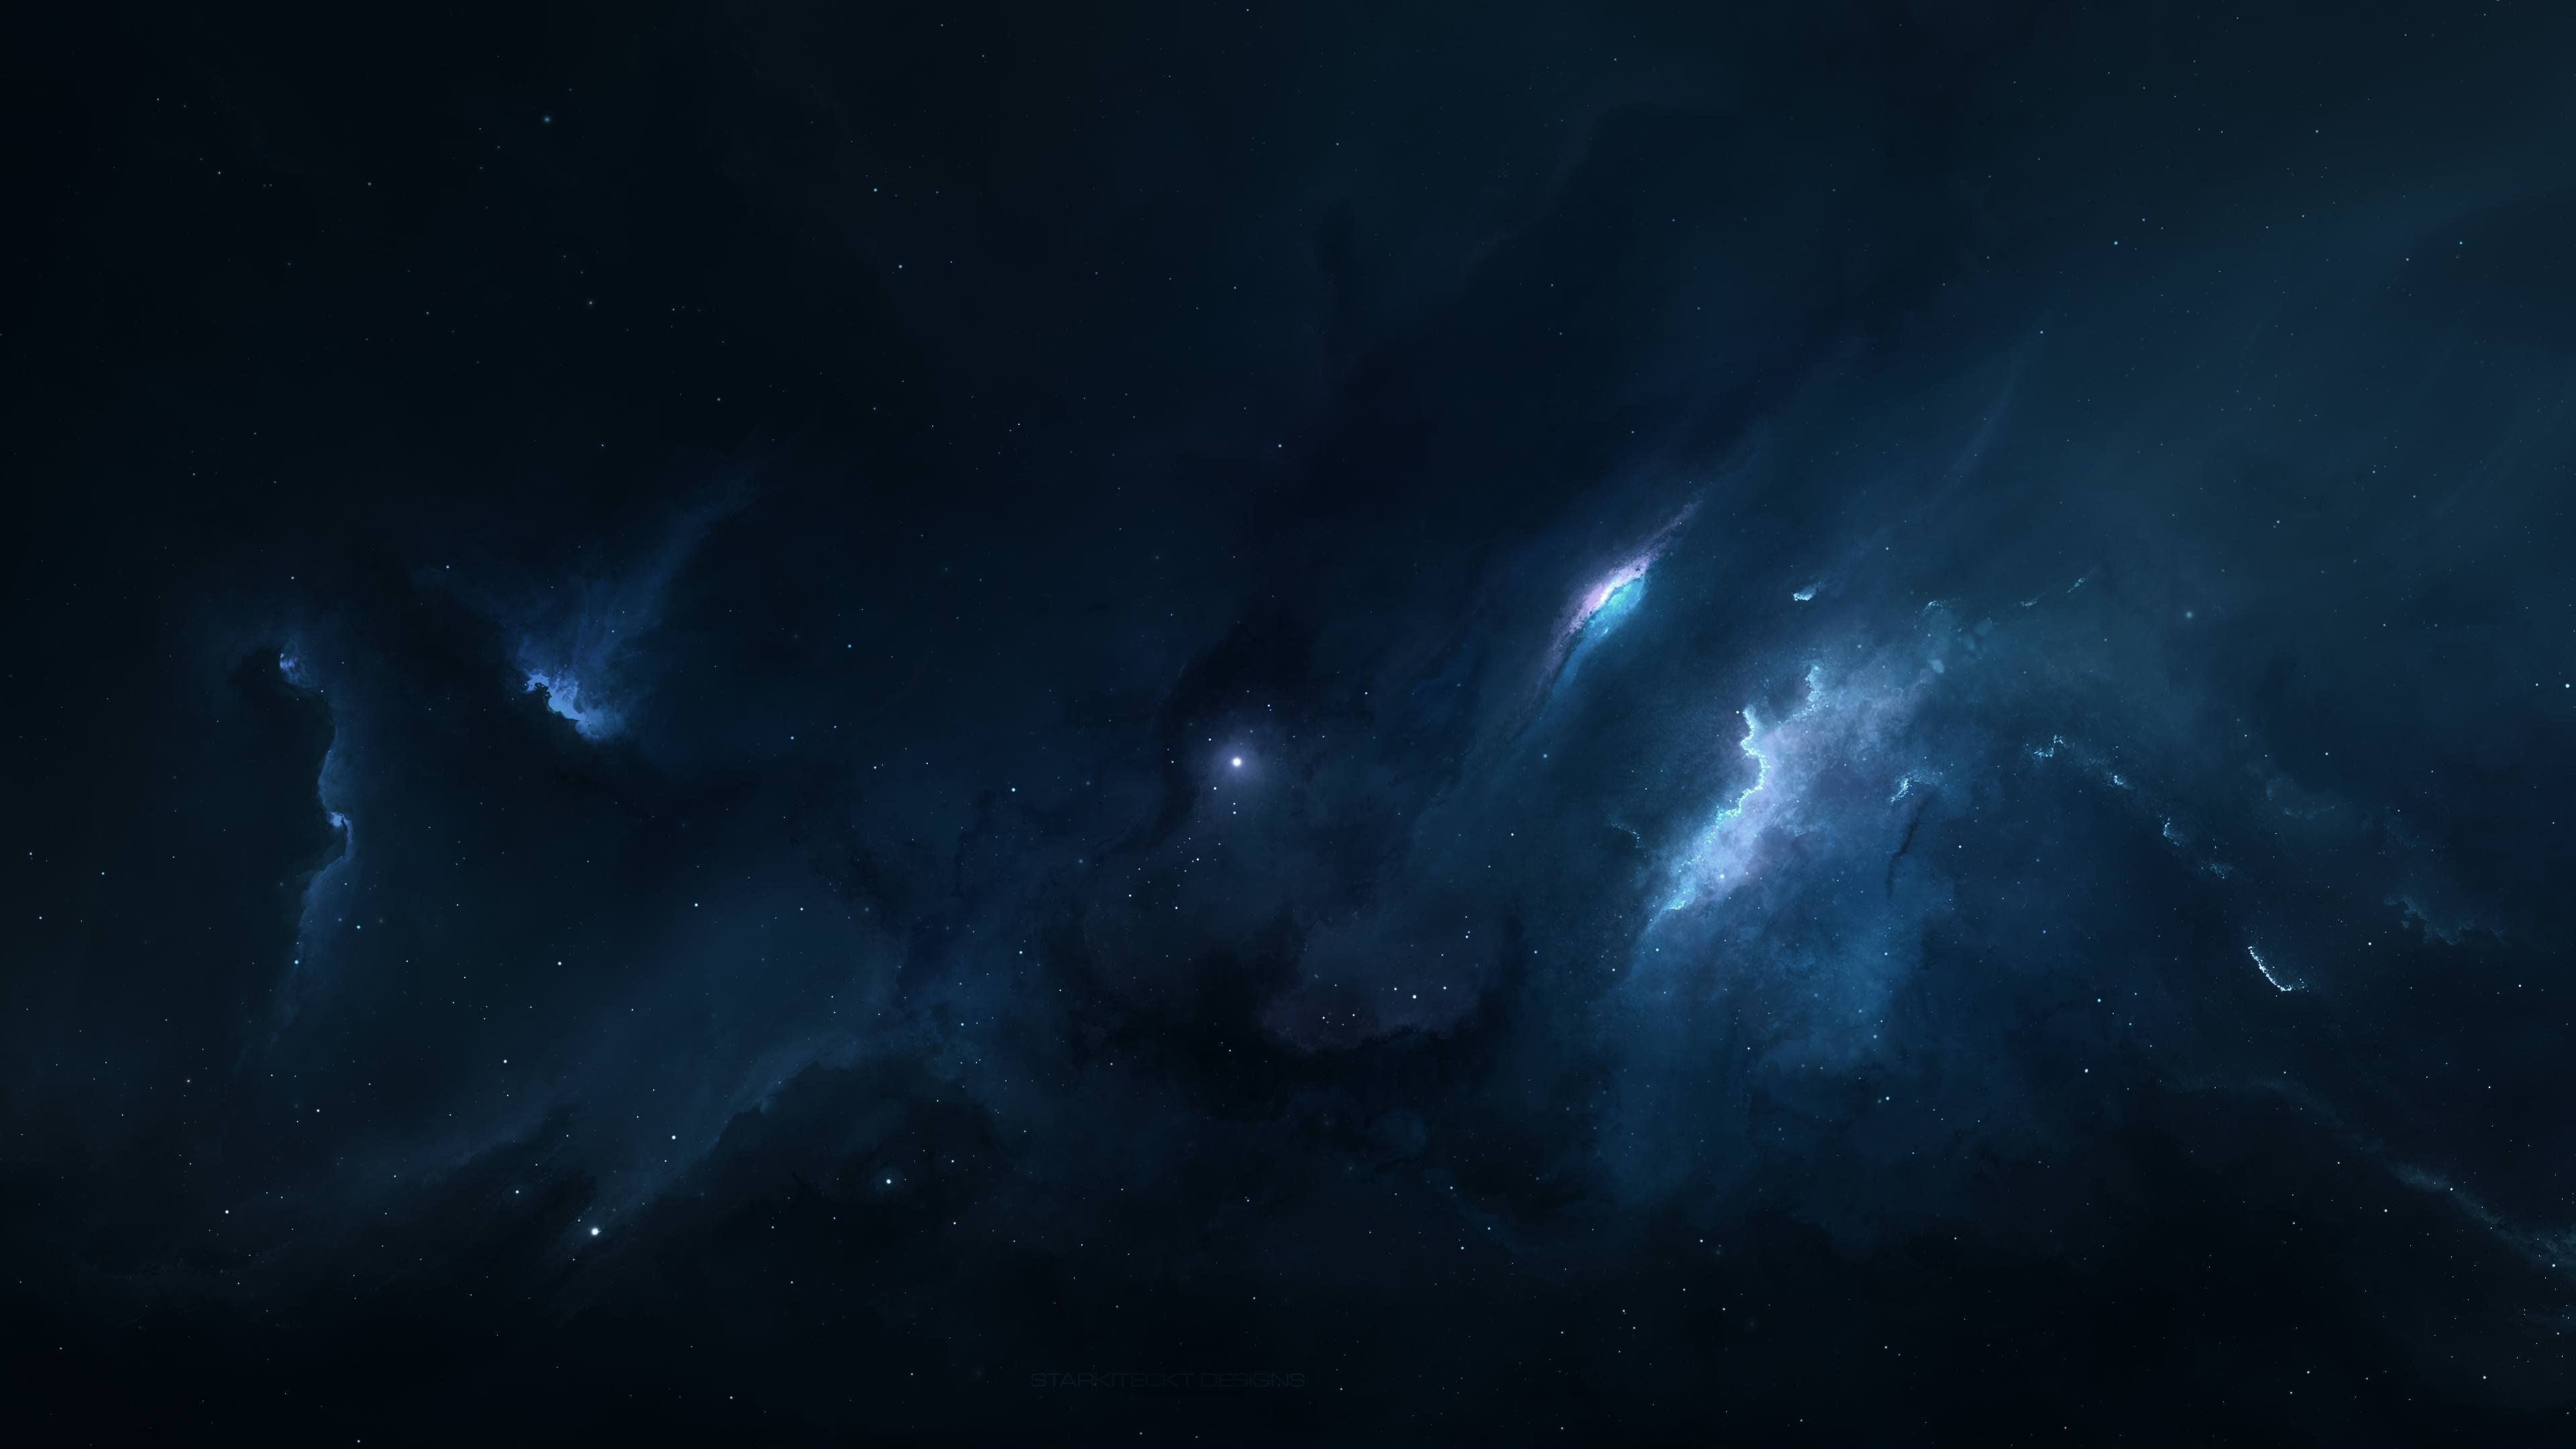 Blue Nebula 4K wallpaper Blue Nebula Wallpaper Widescreen